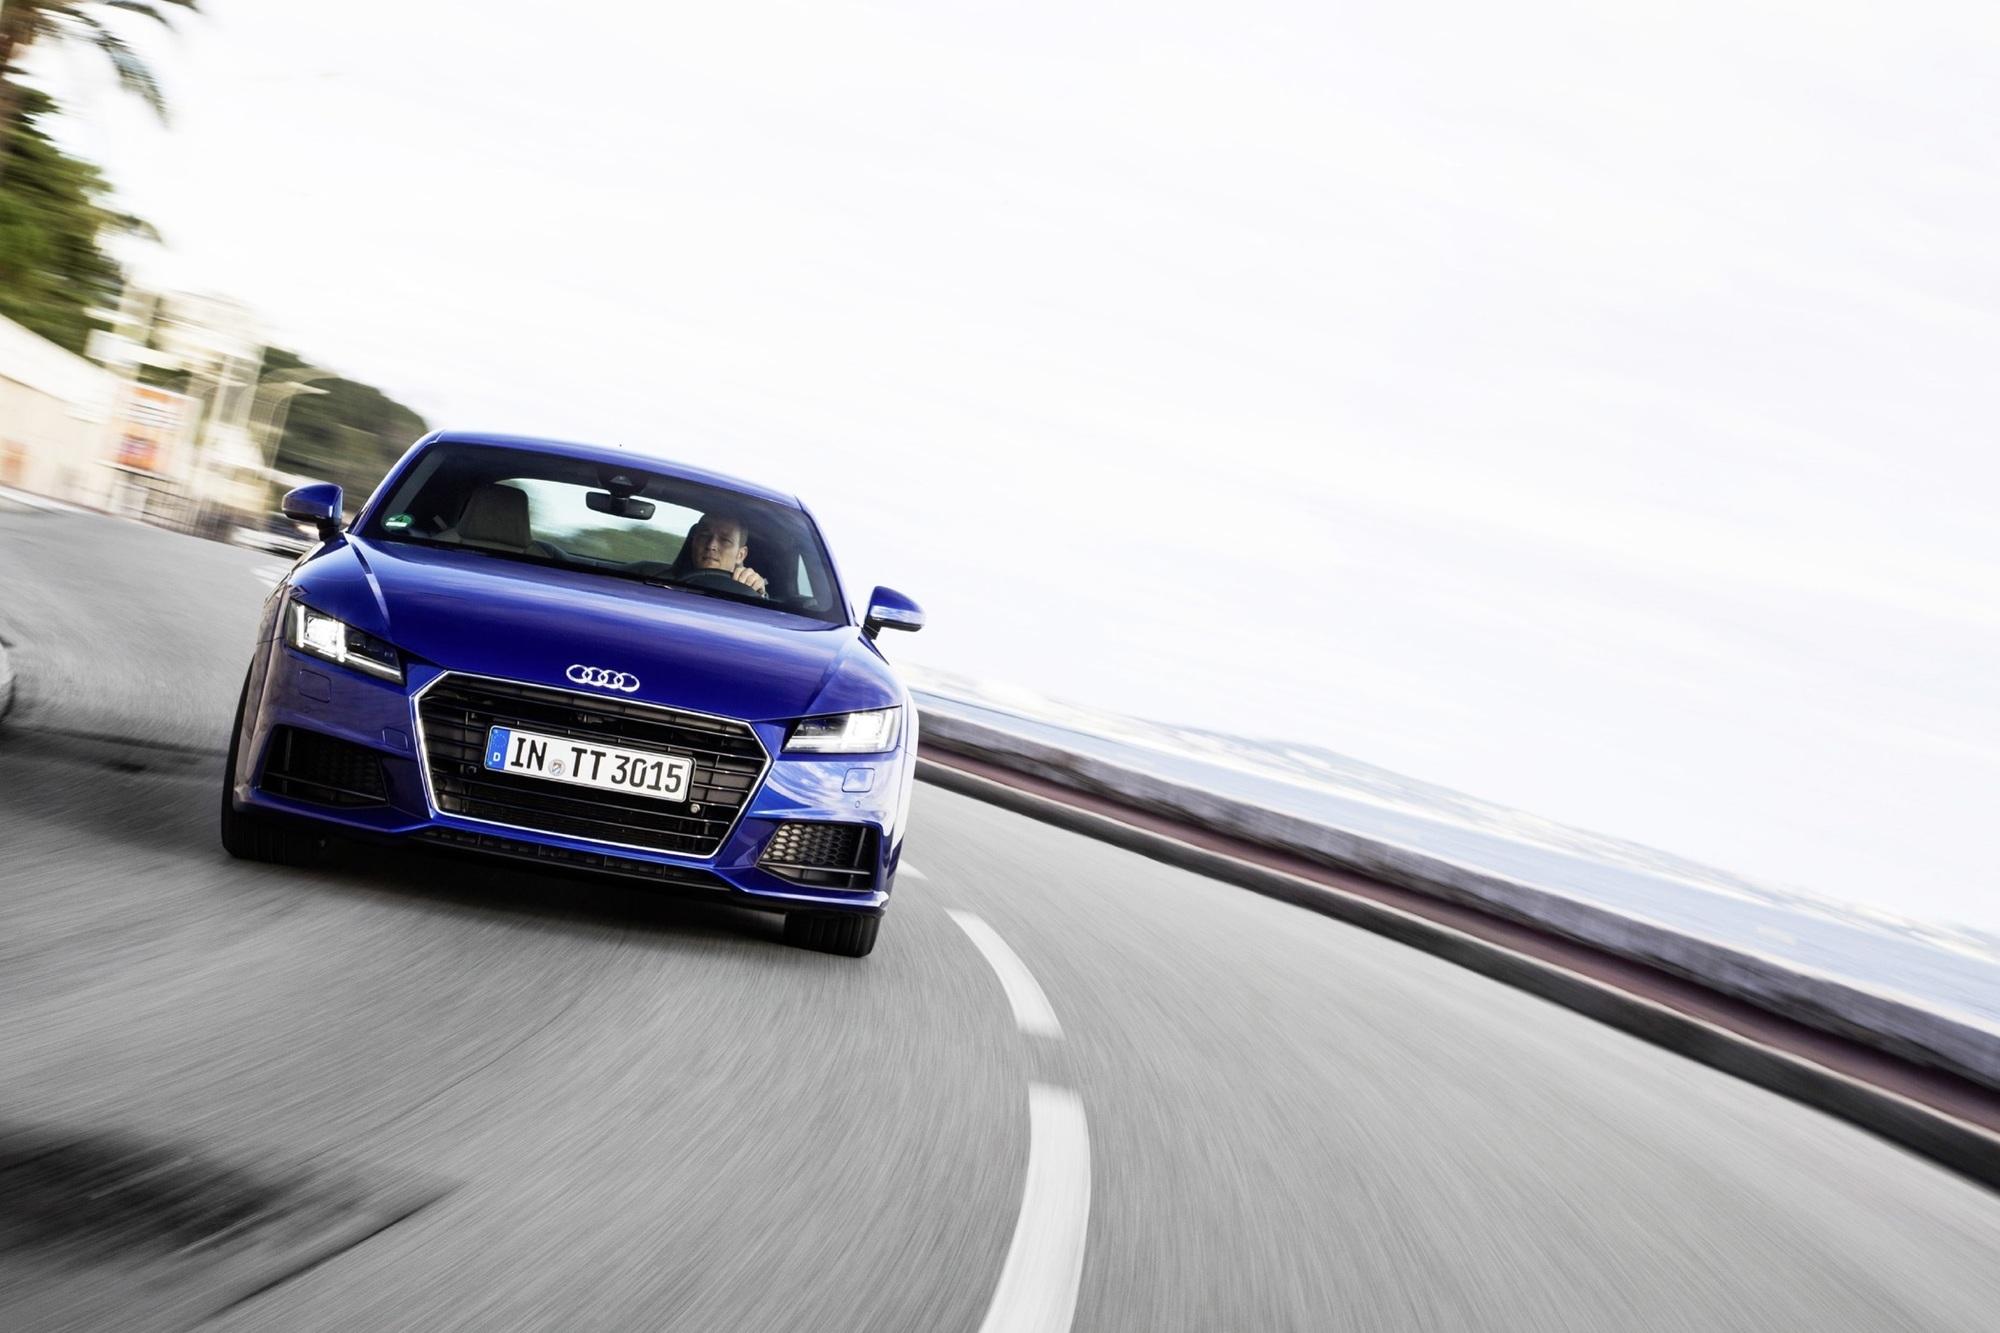 Audi TT - Neuer Basisbenziner